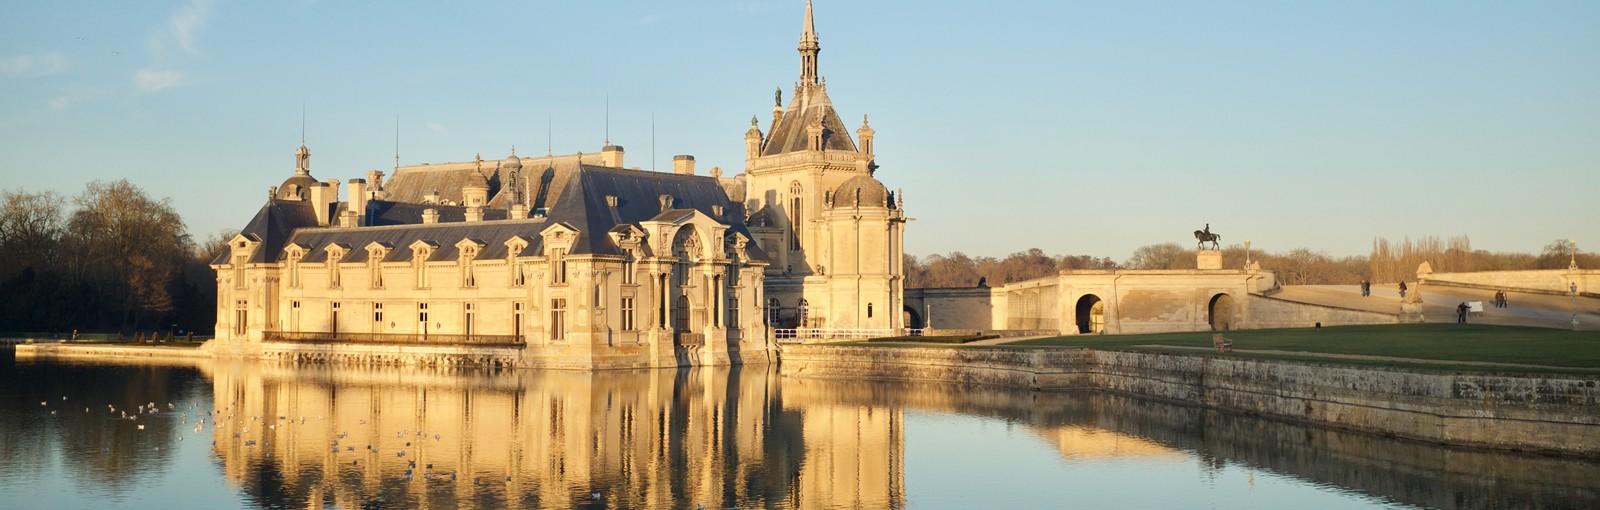 Tours 尚蒂伊城堡 - 半日游 - 从巴黎出发的一日游